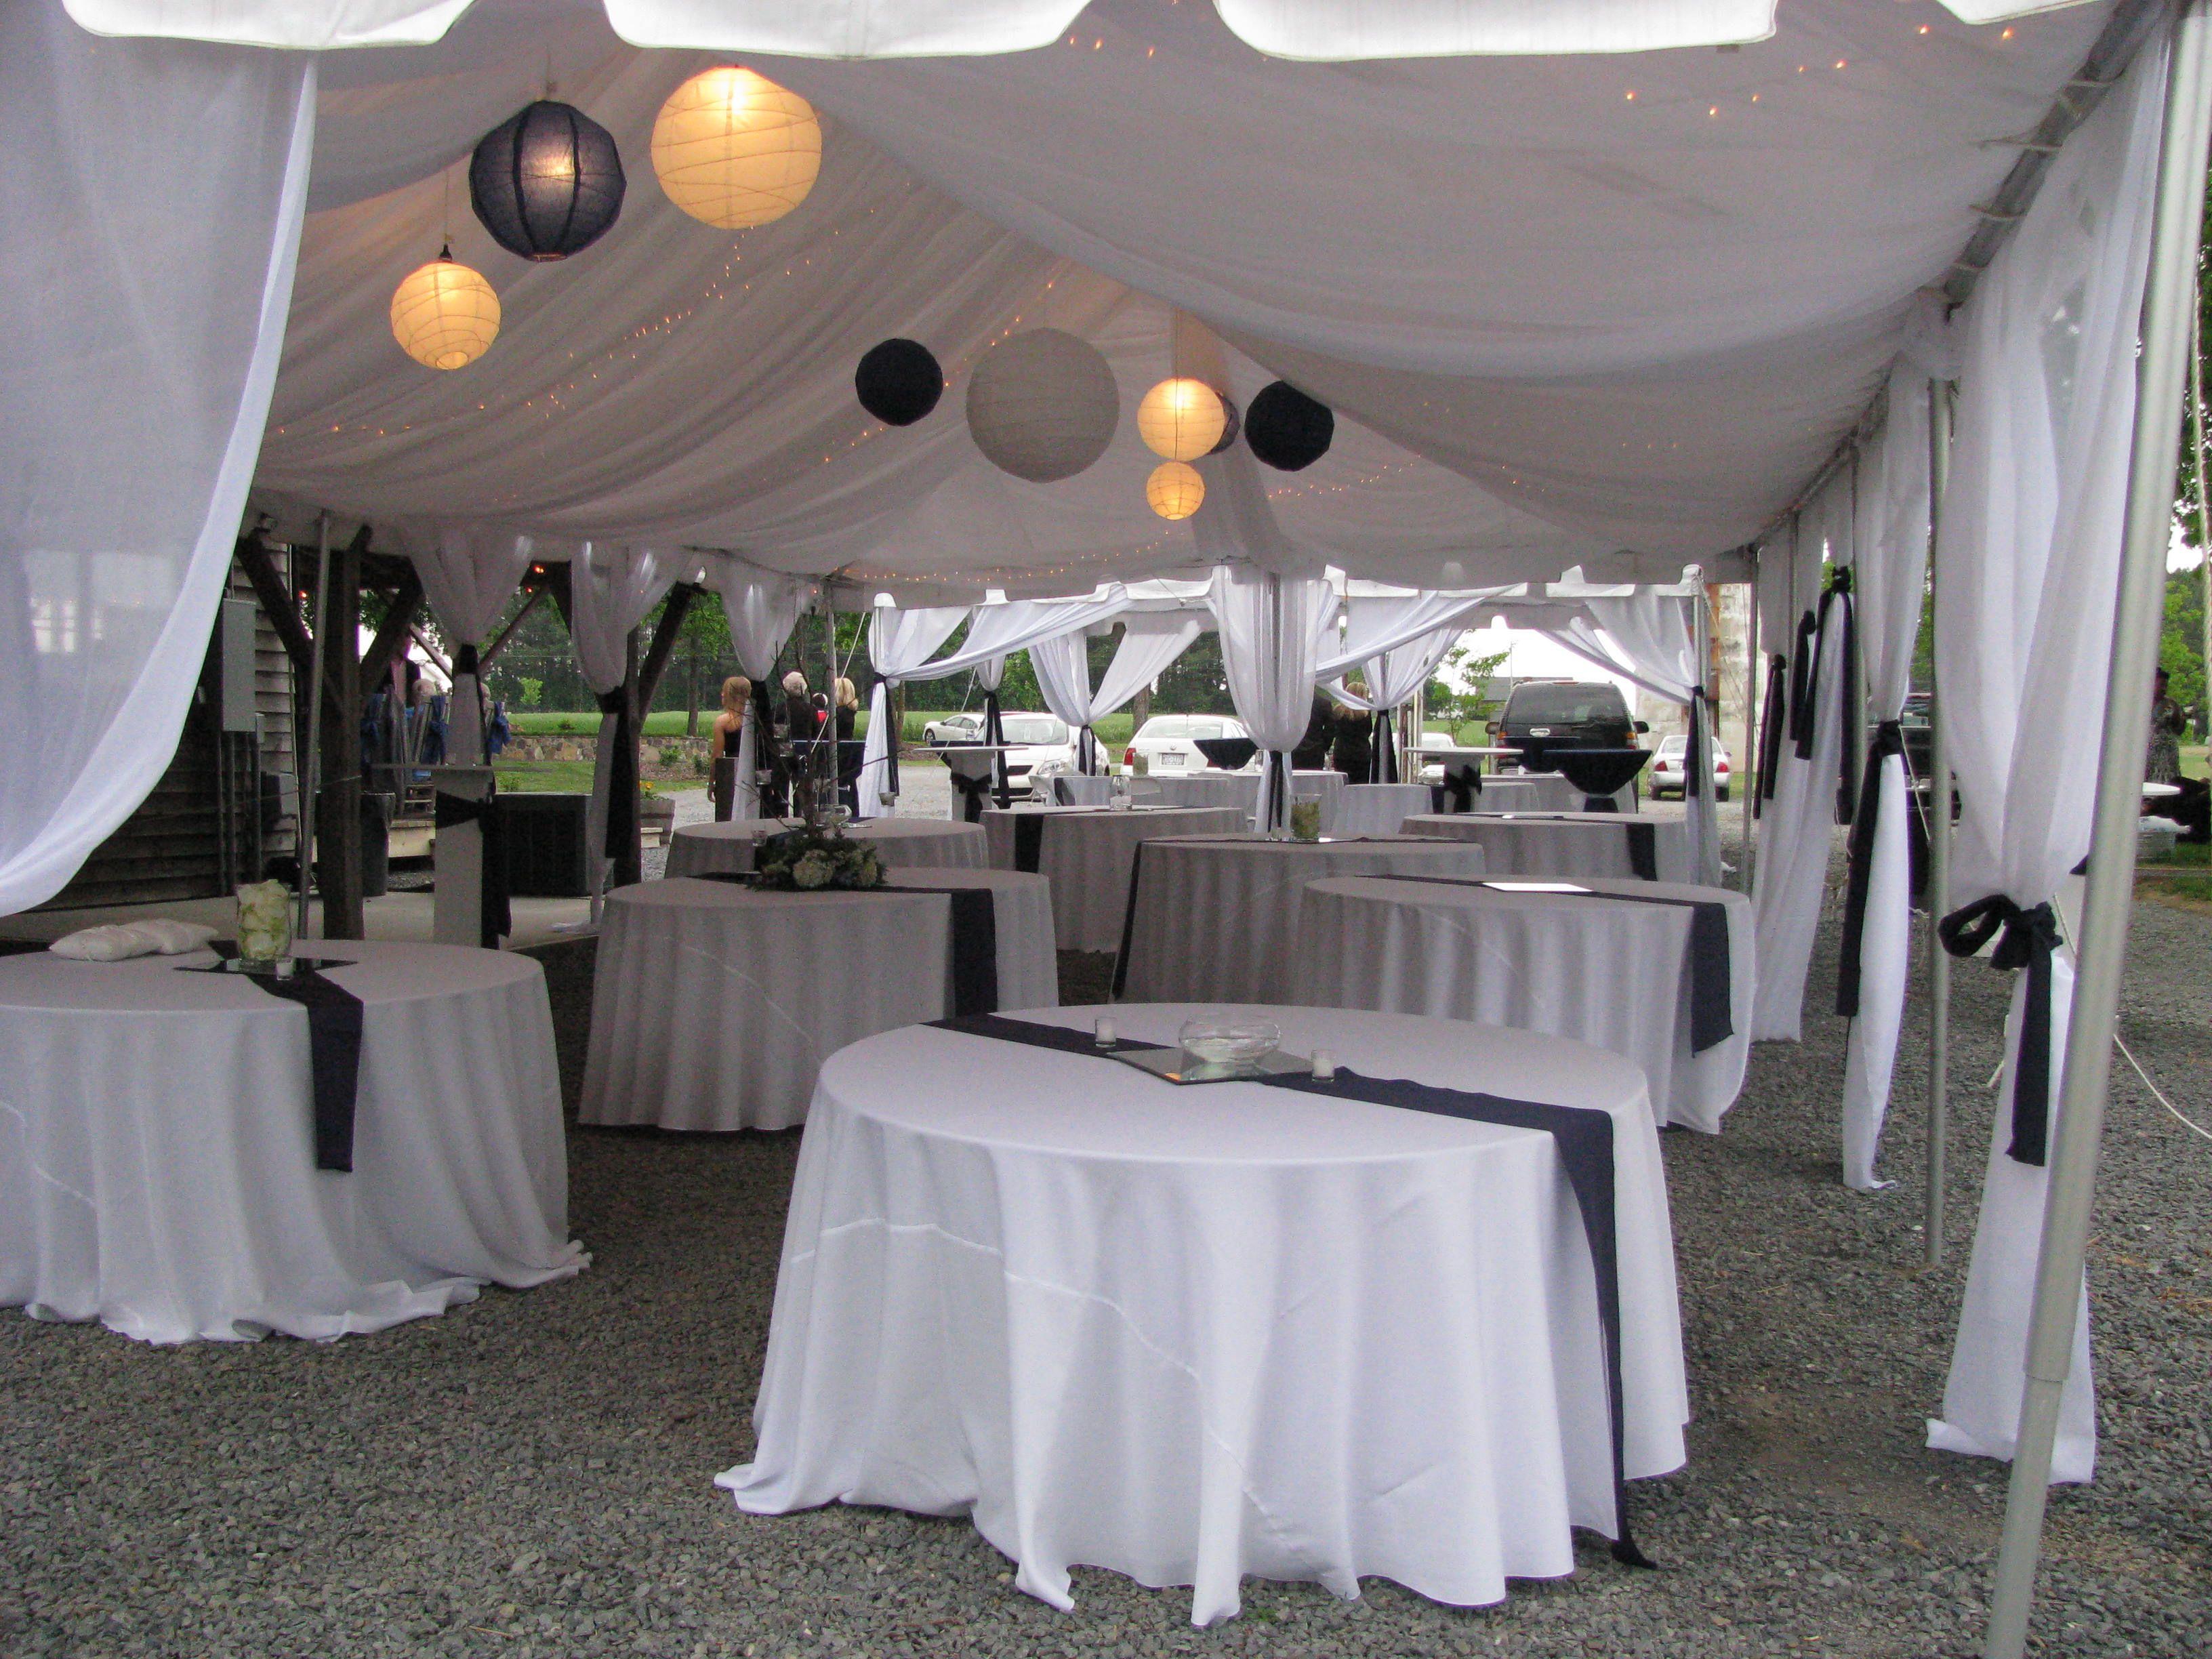 The Lodge on Hatley FarmAlbemarle, NC Wedding/Reception